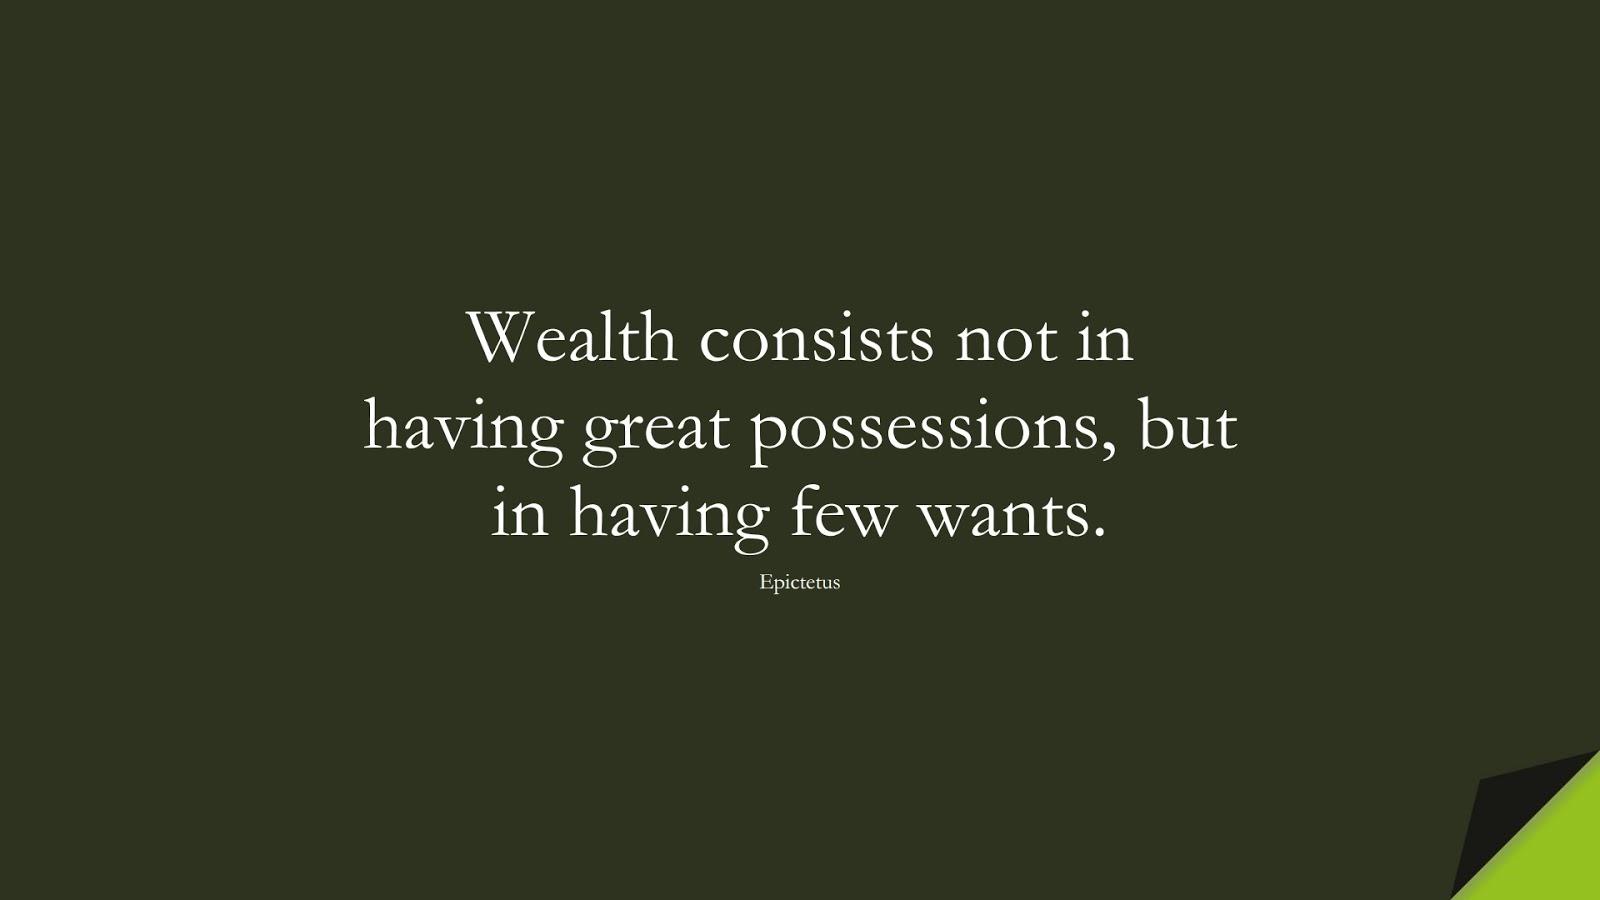 Wealth consists not in having great possessions, but in having few wants. (Epictetus);  #WordsofWisdom